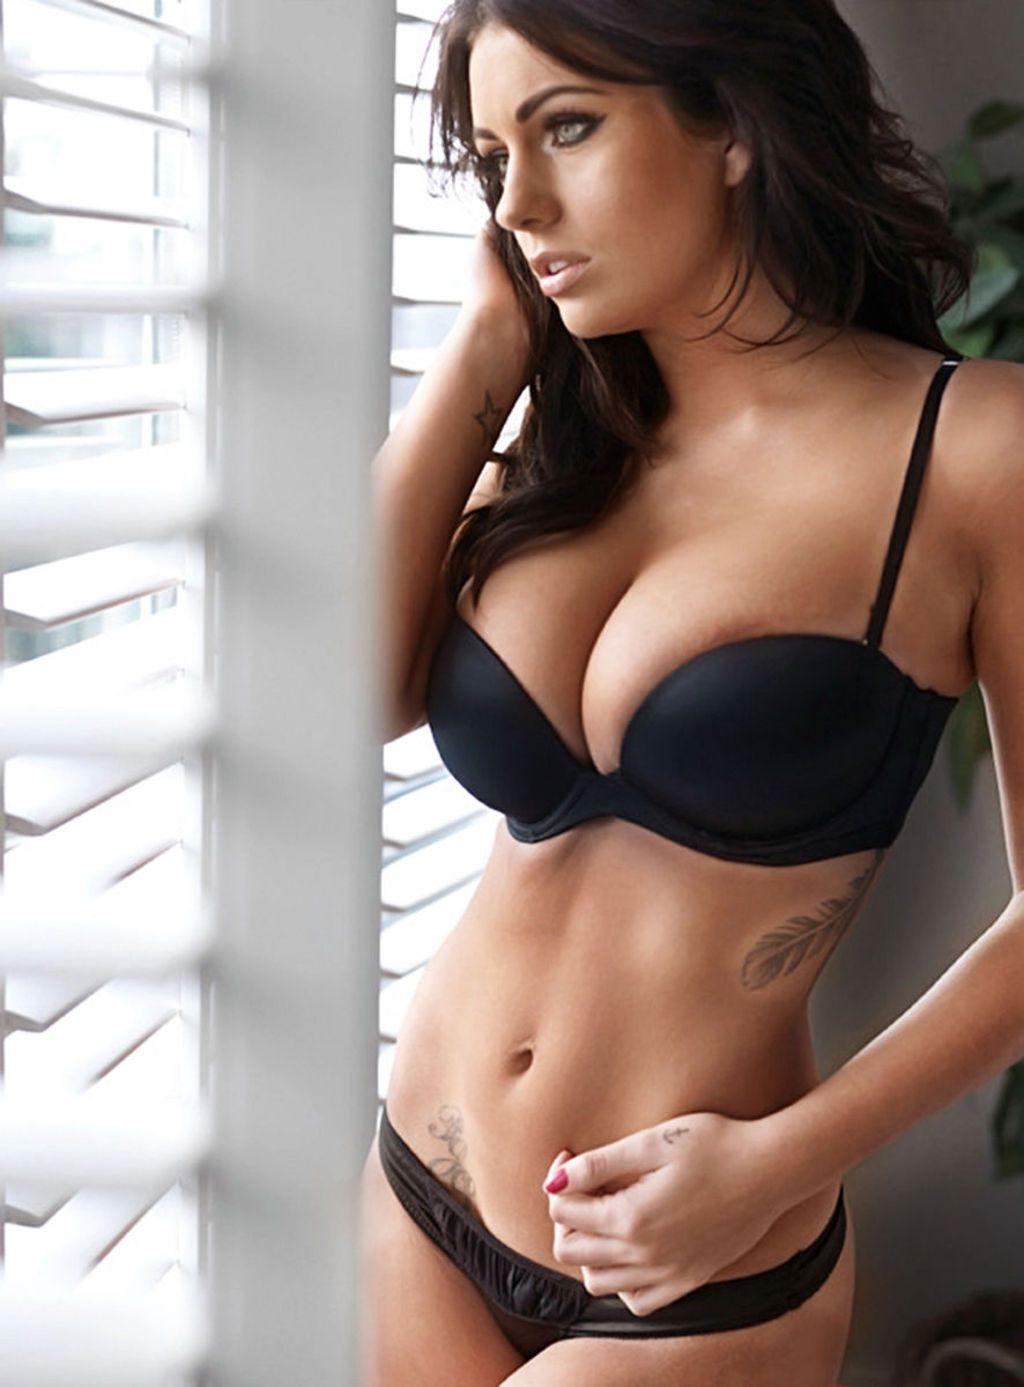 Single deluxe breast pump from medela